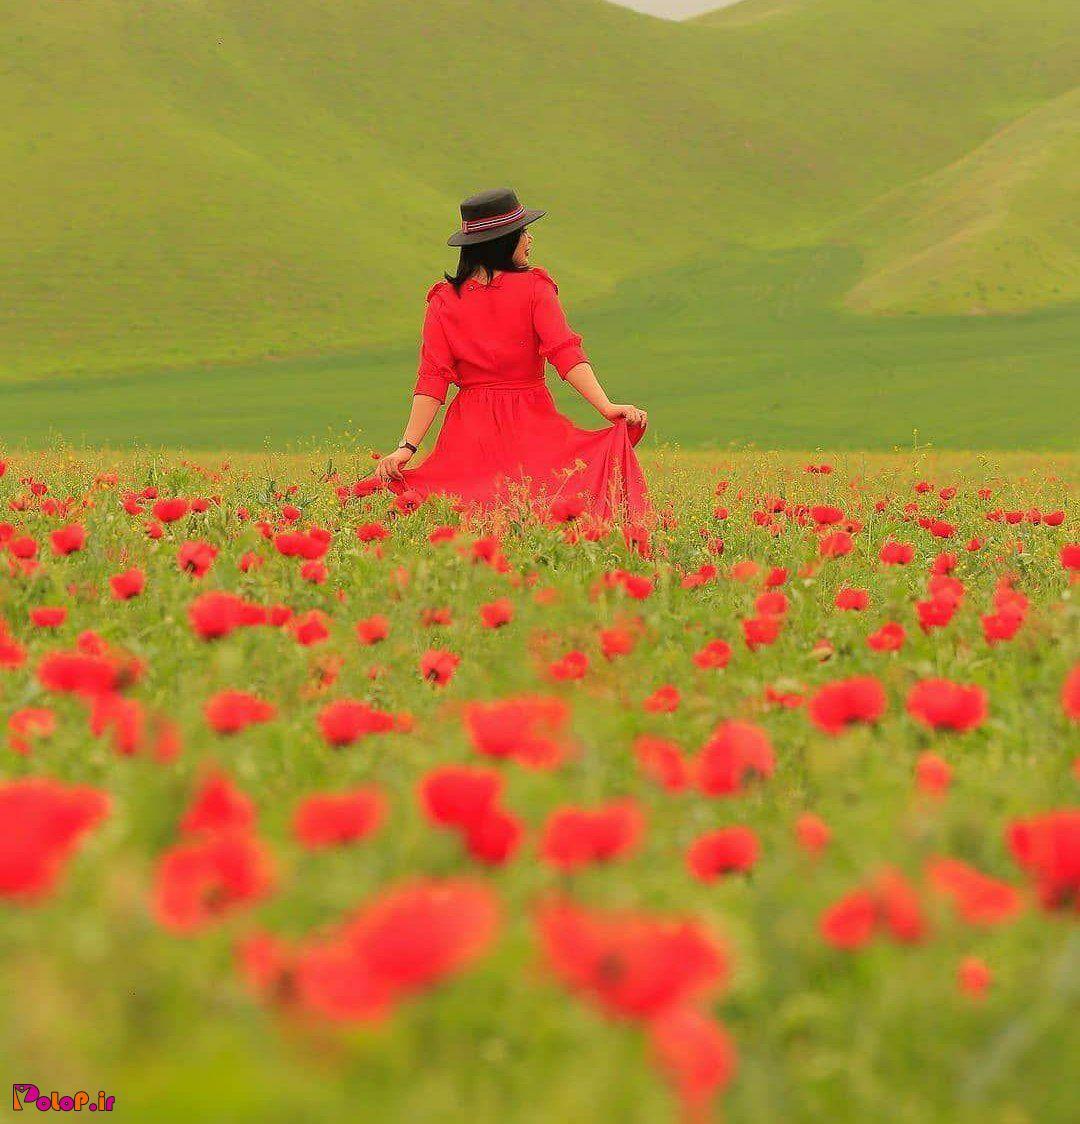 خالدنبی، کلاله، استان گلستان